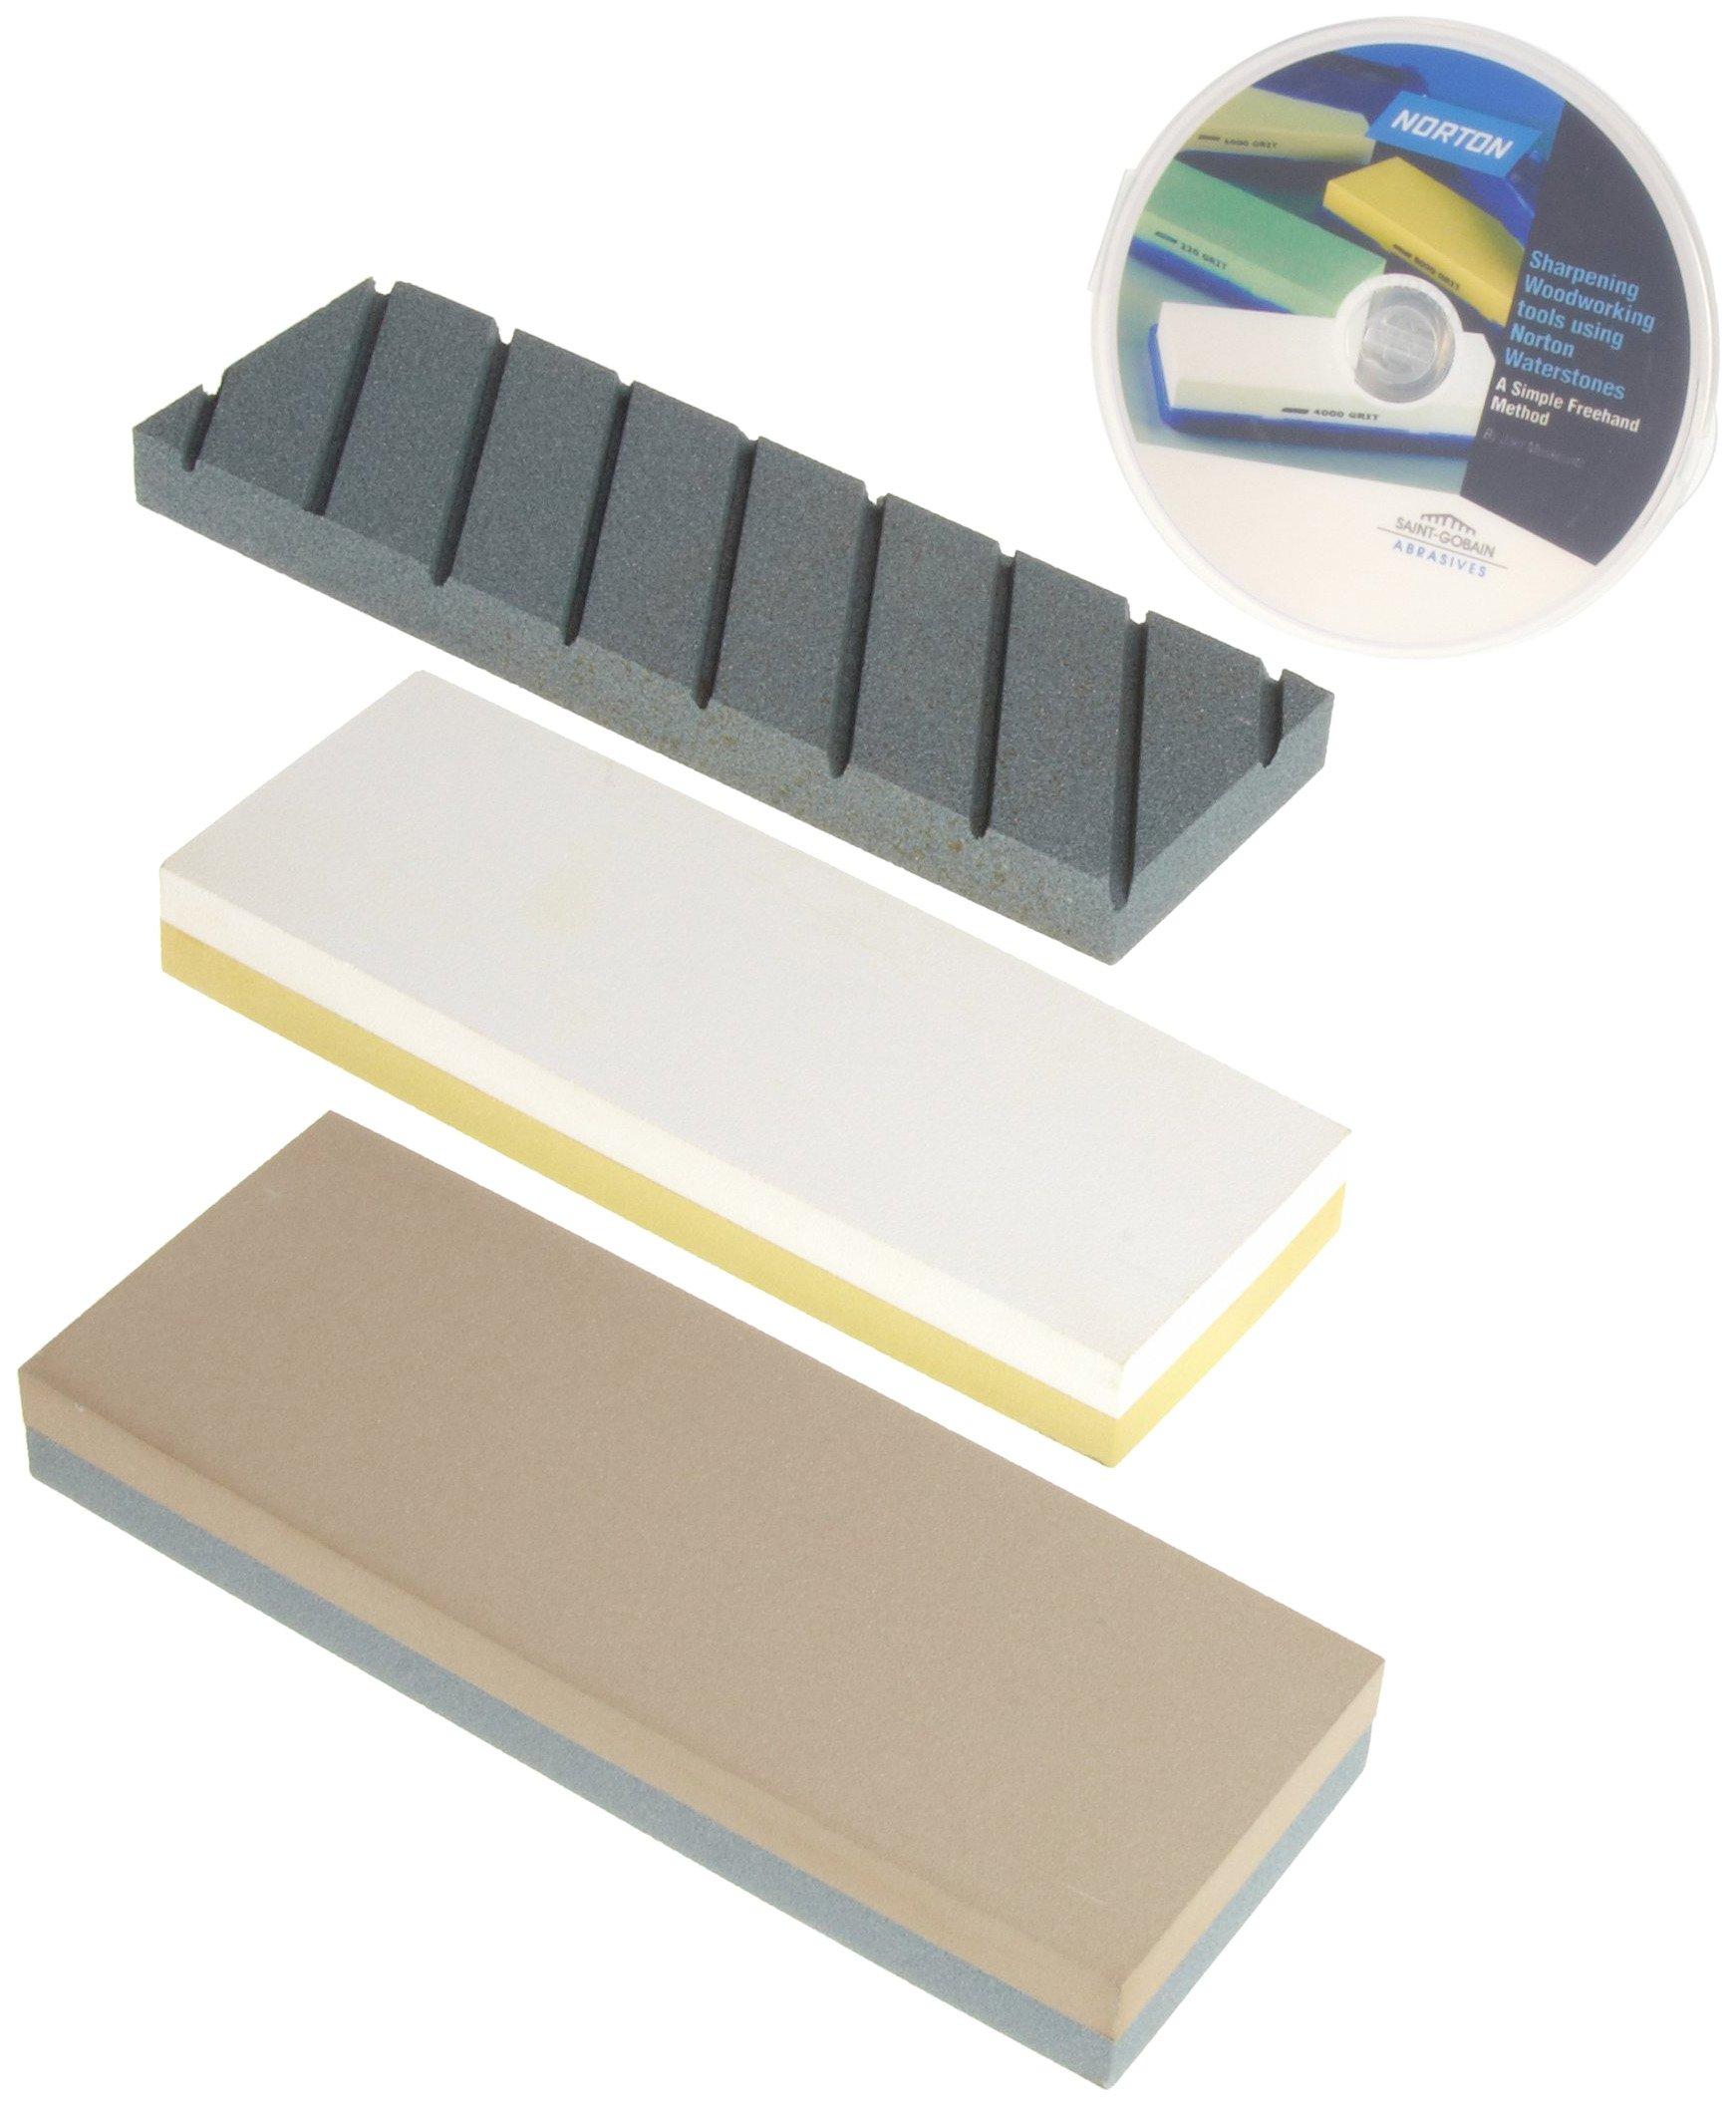 Norton Waterstone Starter Kit: 220/1000 grit stone, 4000/8000 grit stone, SiC flattening stone